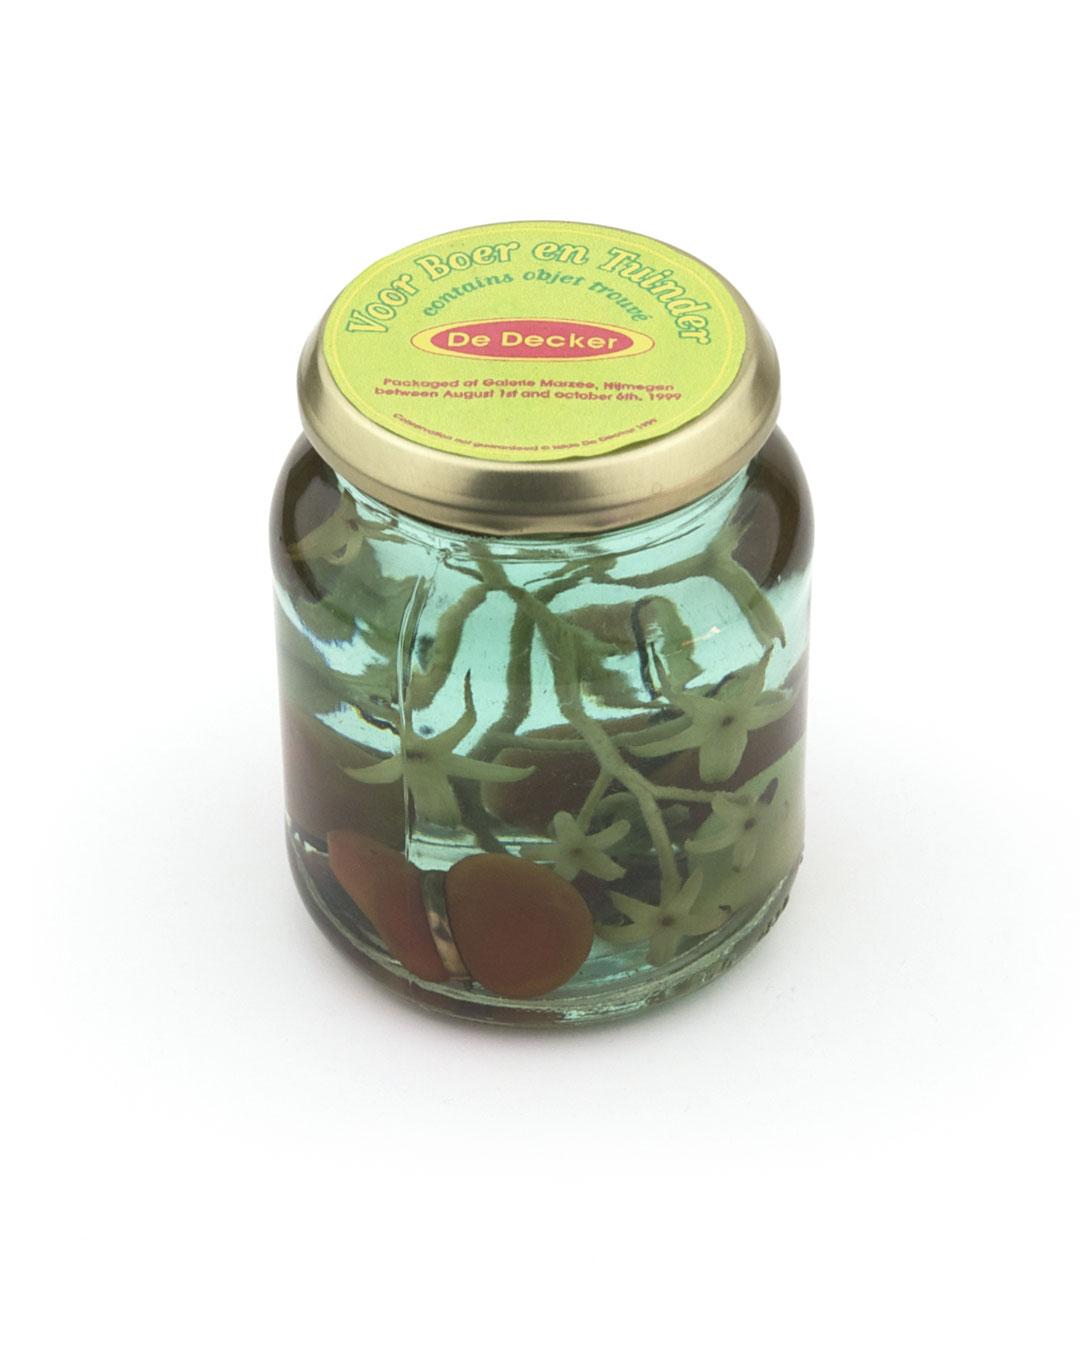 Hilde De Decker, Voor boer en tuinder (For the Farmer and the Market Gardener), packaged at Galerie Marzee, 1999, object; glass, vinegar, vegetable, found object, ø 80 x 100 mm